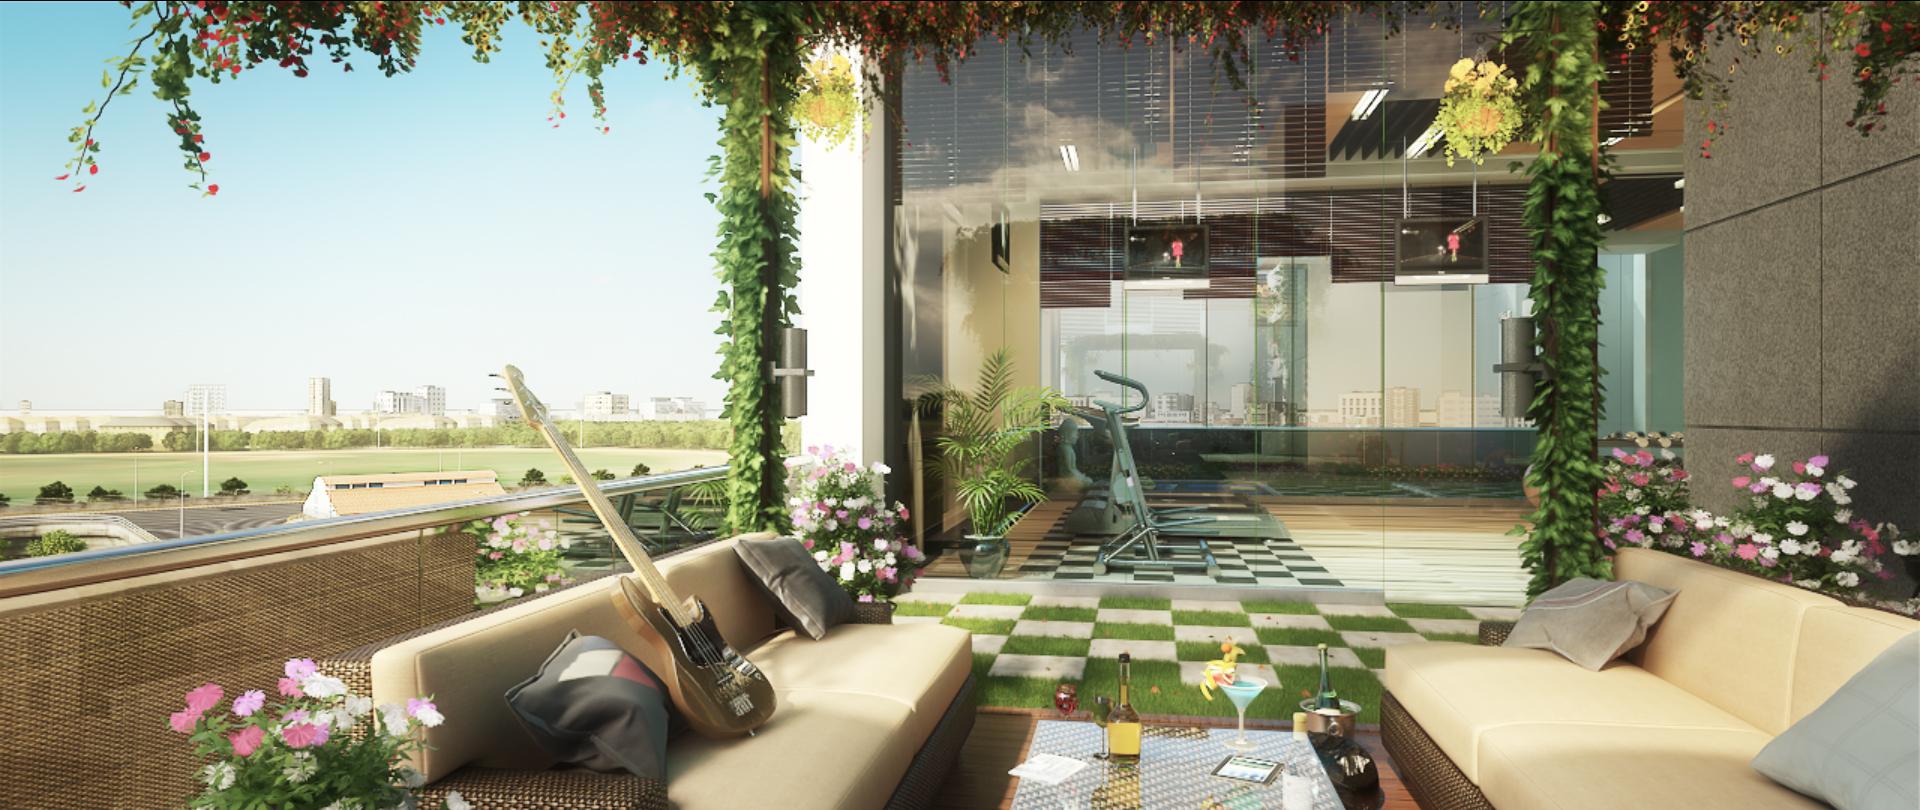 Nahar Excalibur, Mumbai real estate, Malad Property, Luxury real estate, Indian real estate news, India property market, Track2Realty